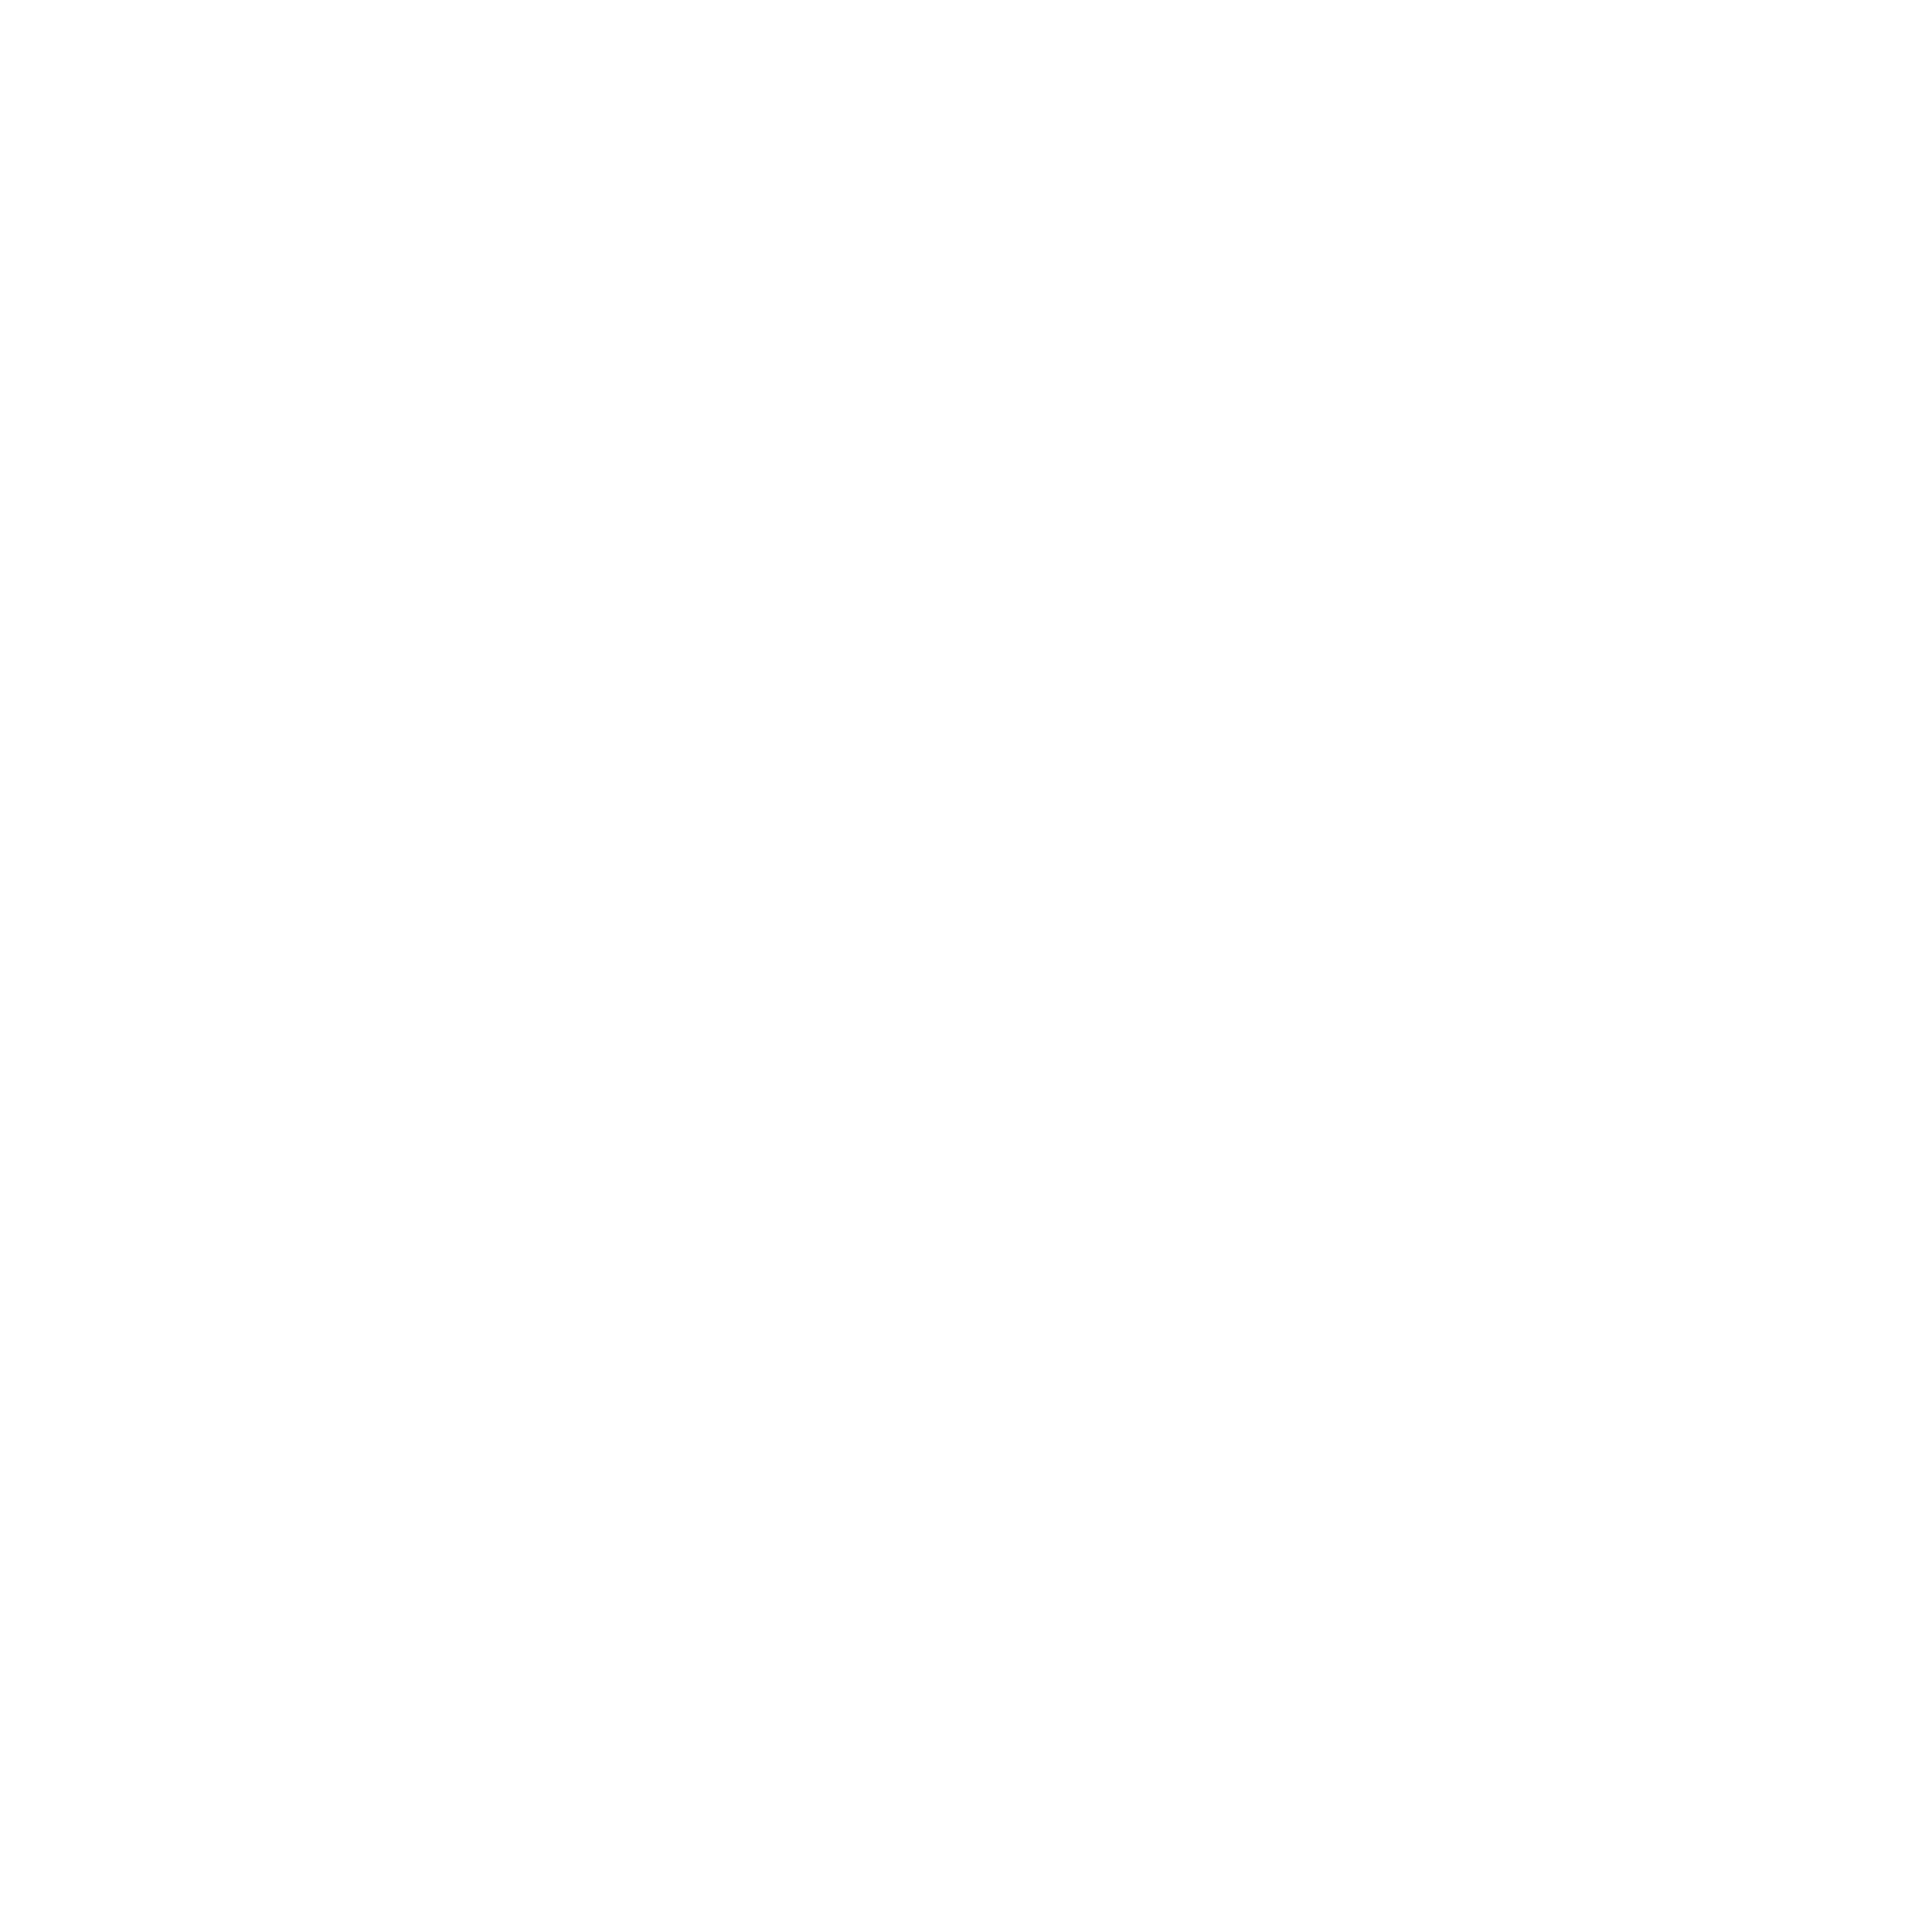 RGU_logo_vertical_WHITE_resized 2.png